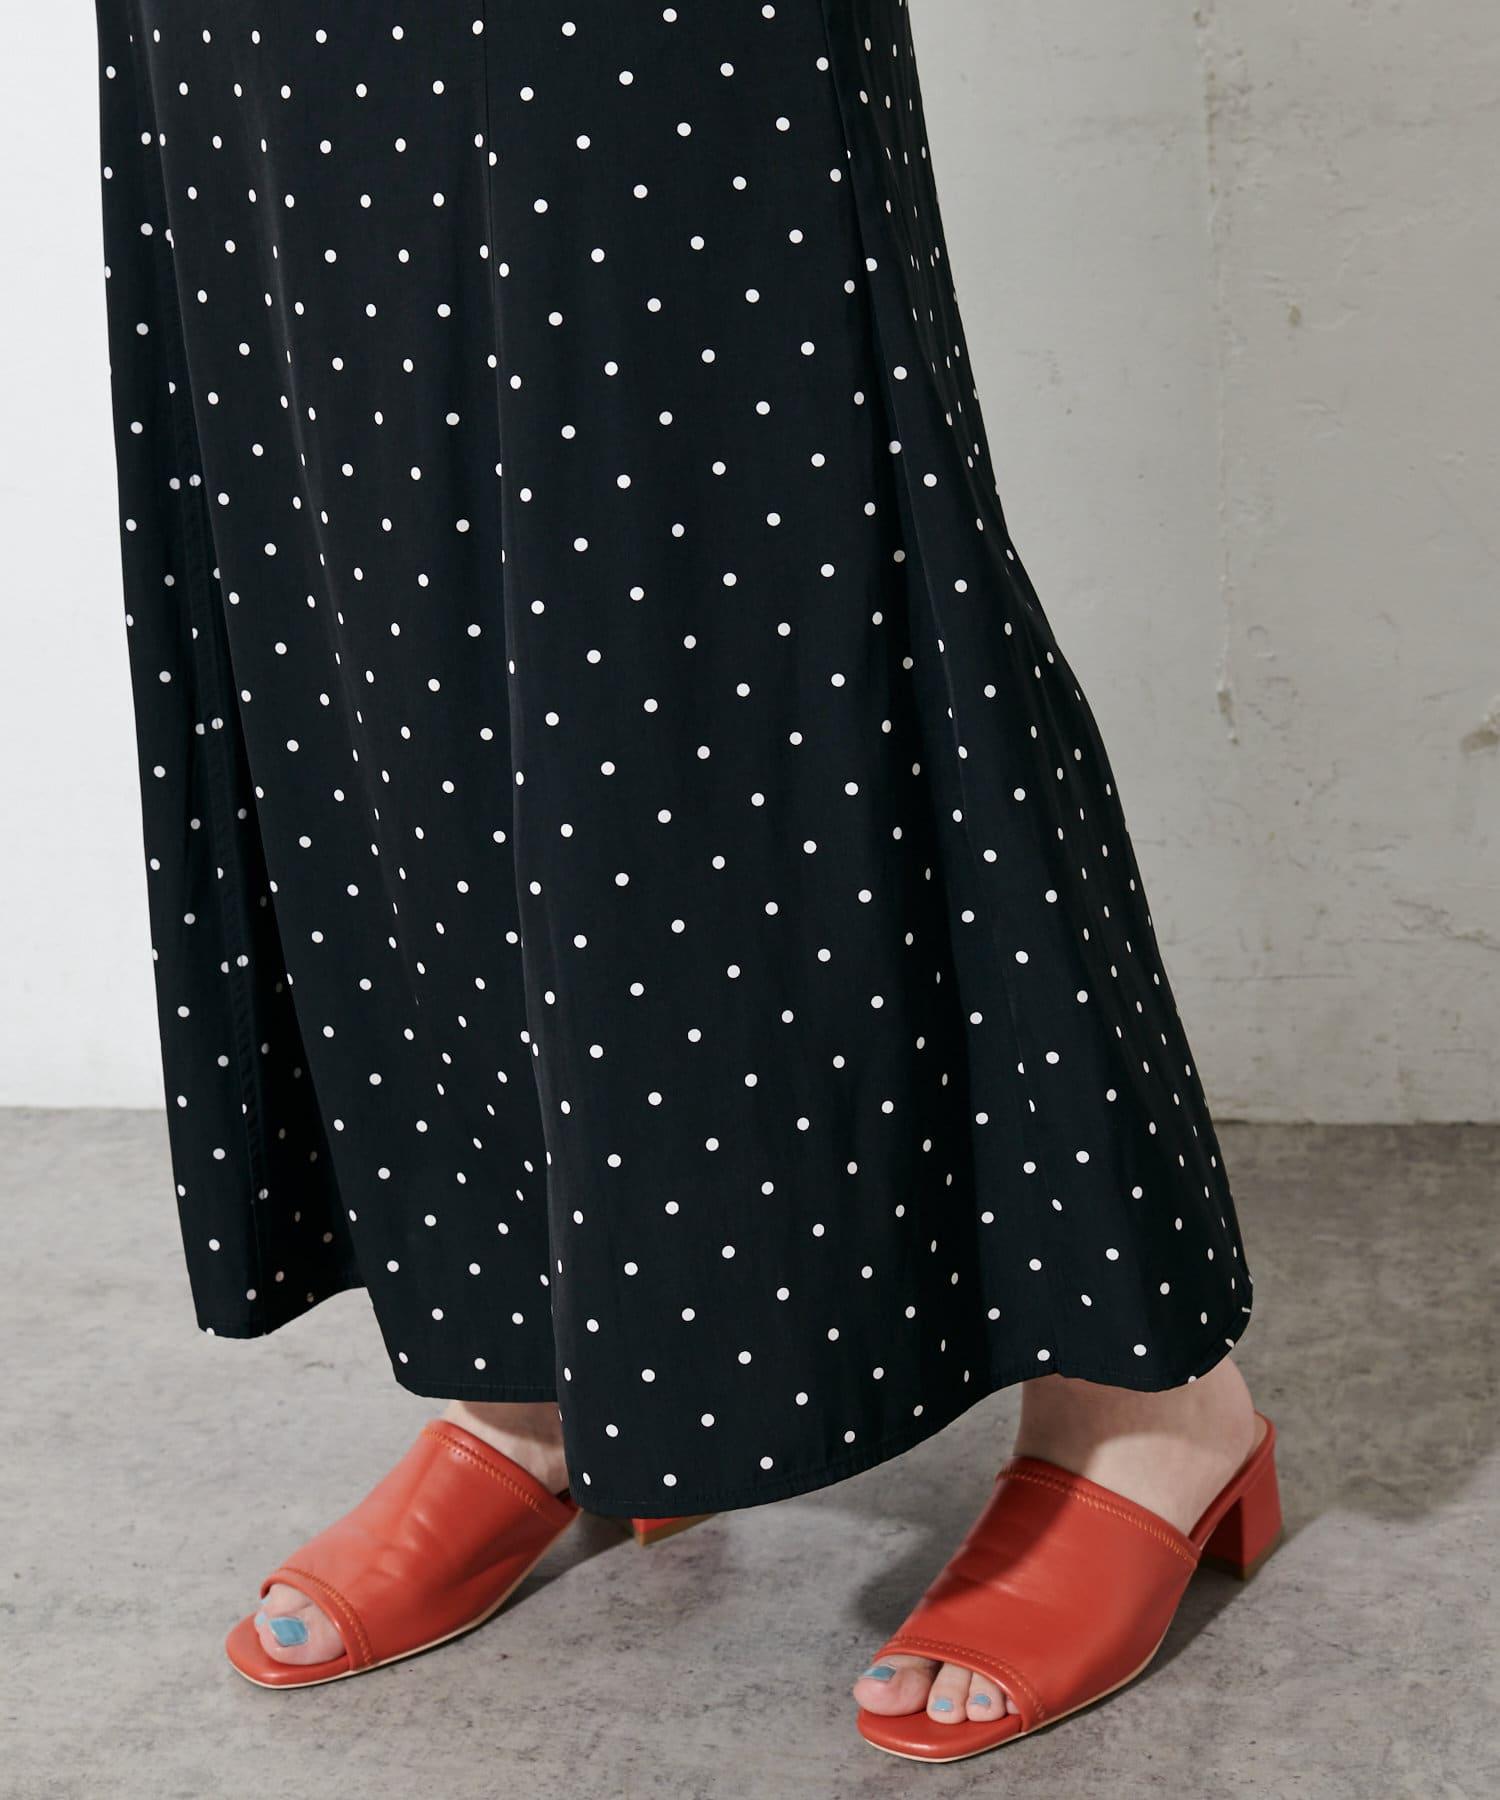 Discoat(ディスコート) ドットマーメイドスカート